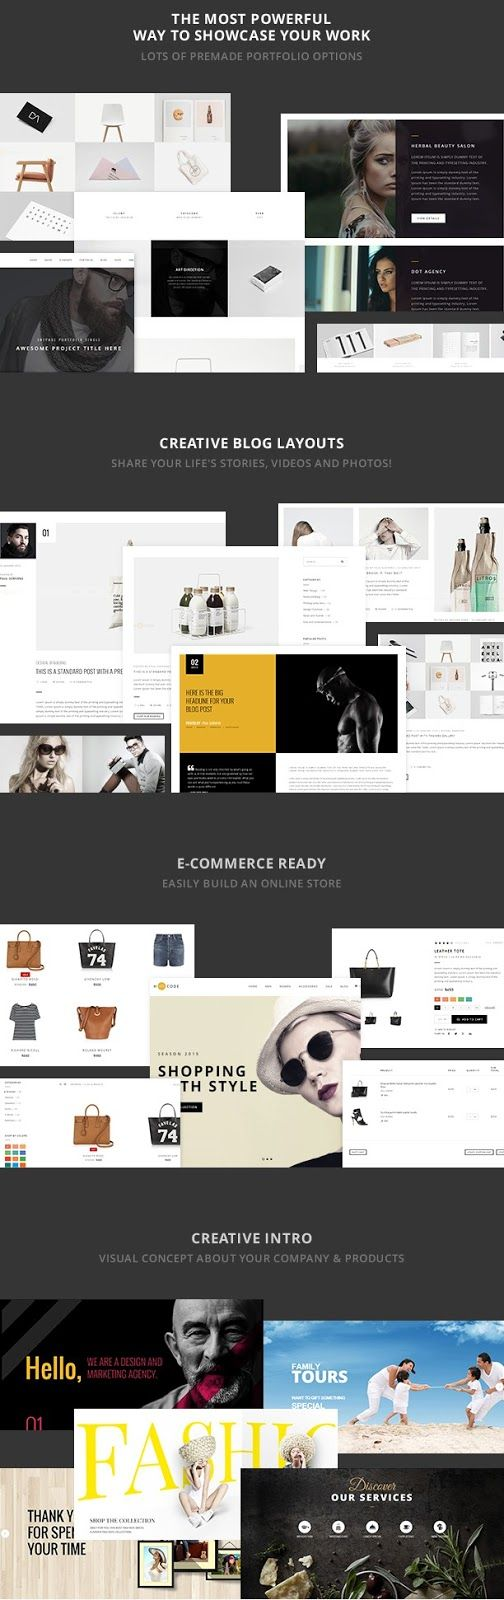 hcode multipurpose commerce drupal theme  latest web